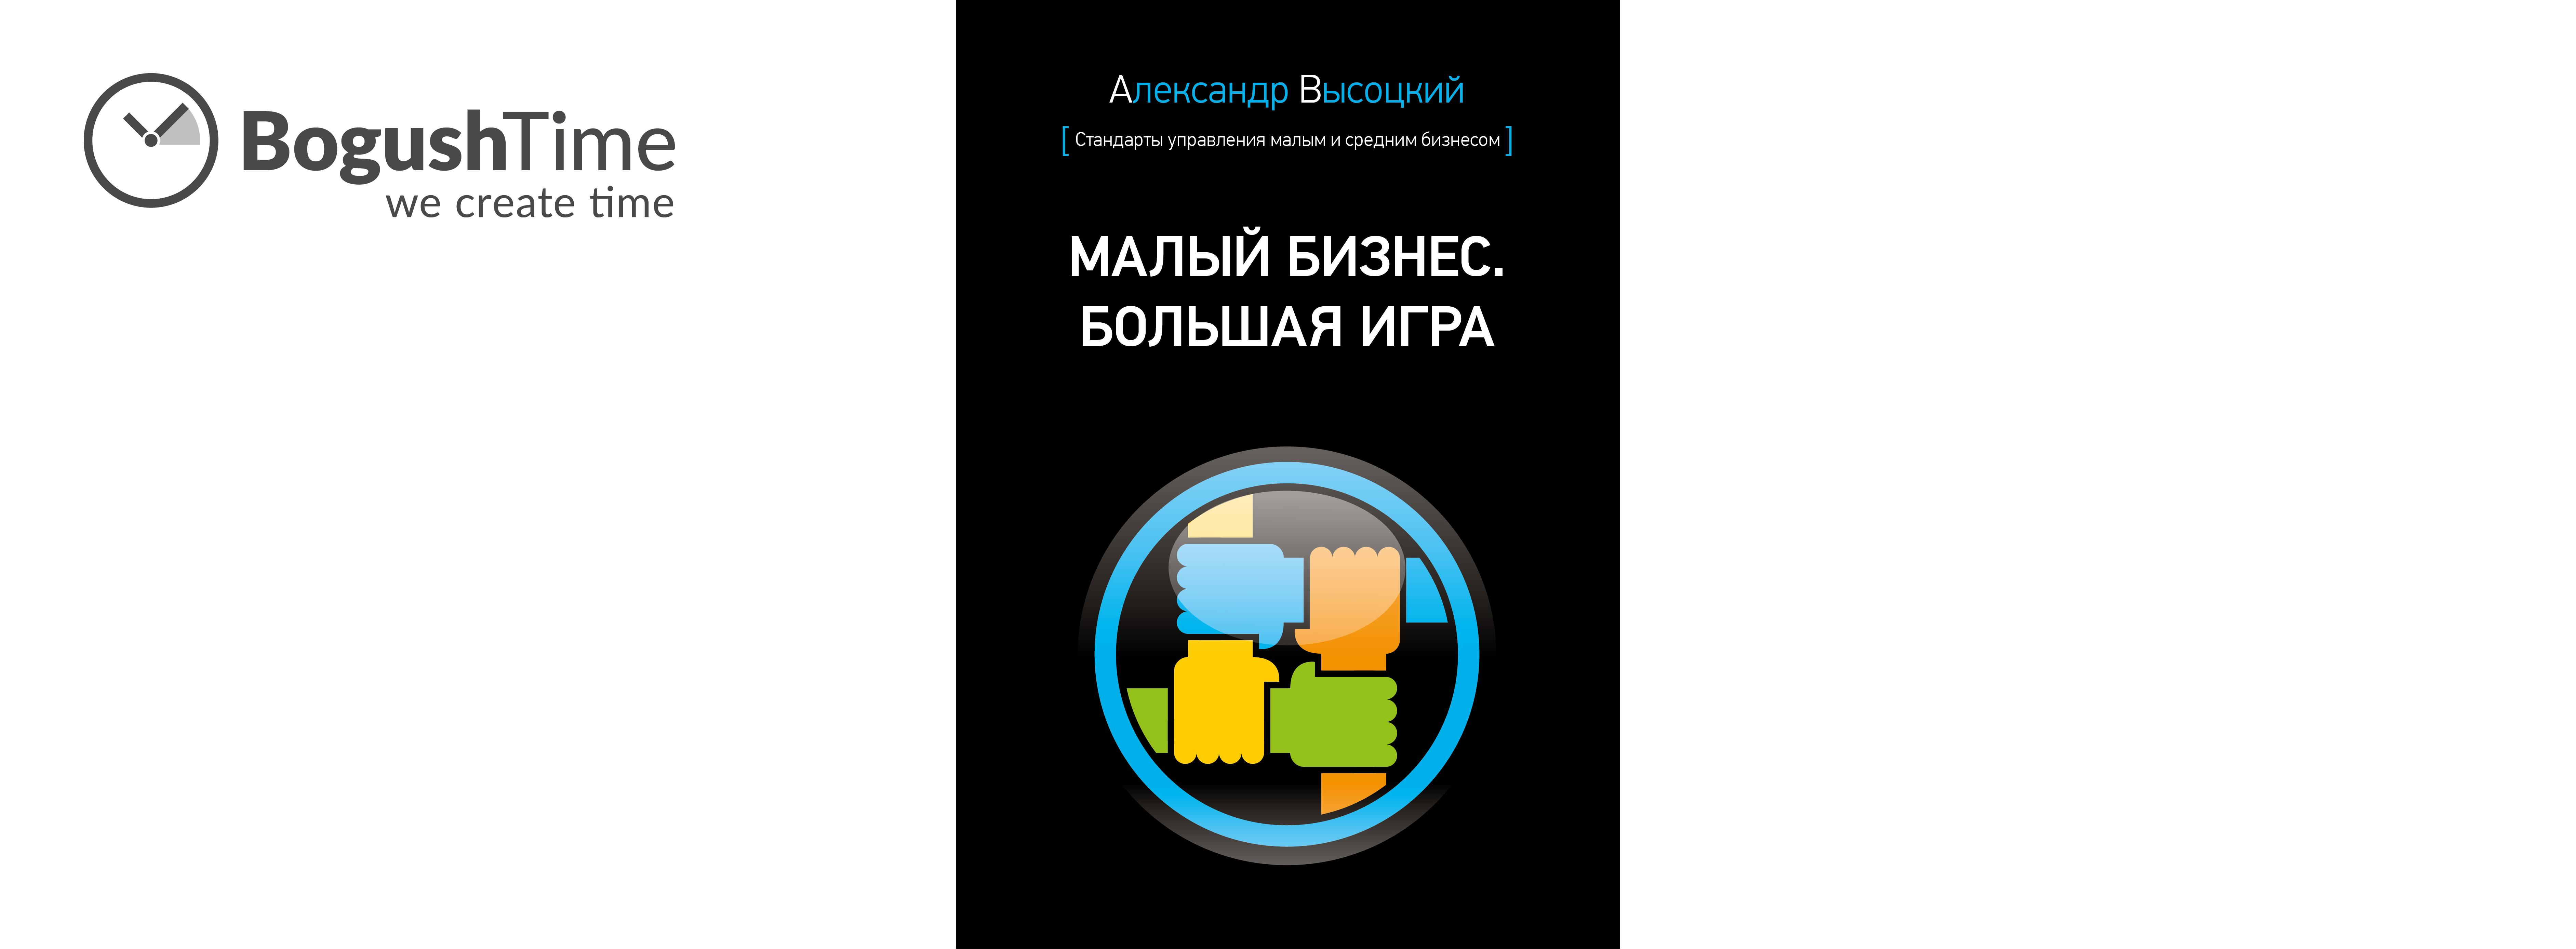 maliy_business_bolshaya_igra1.jpg